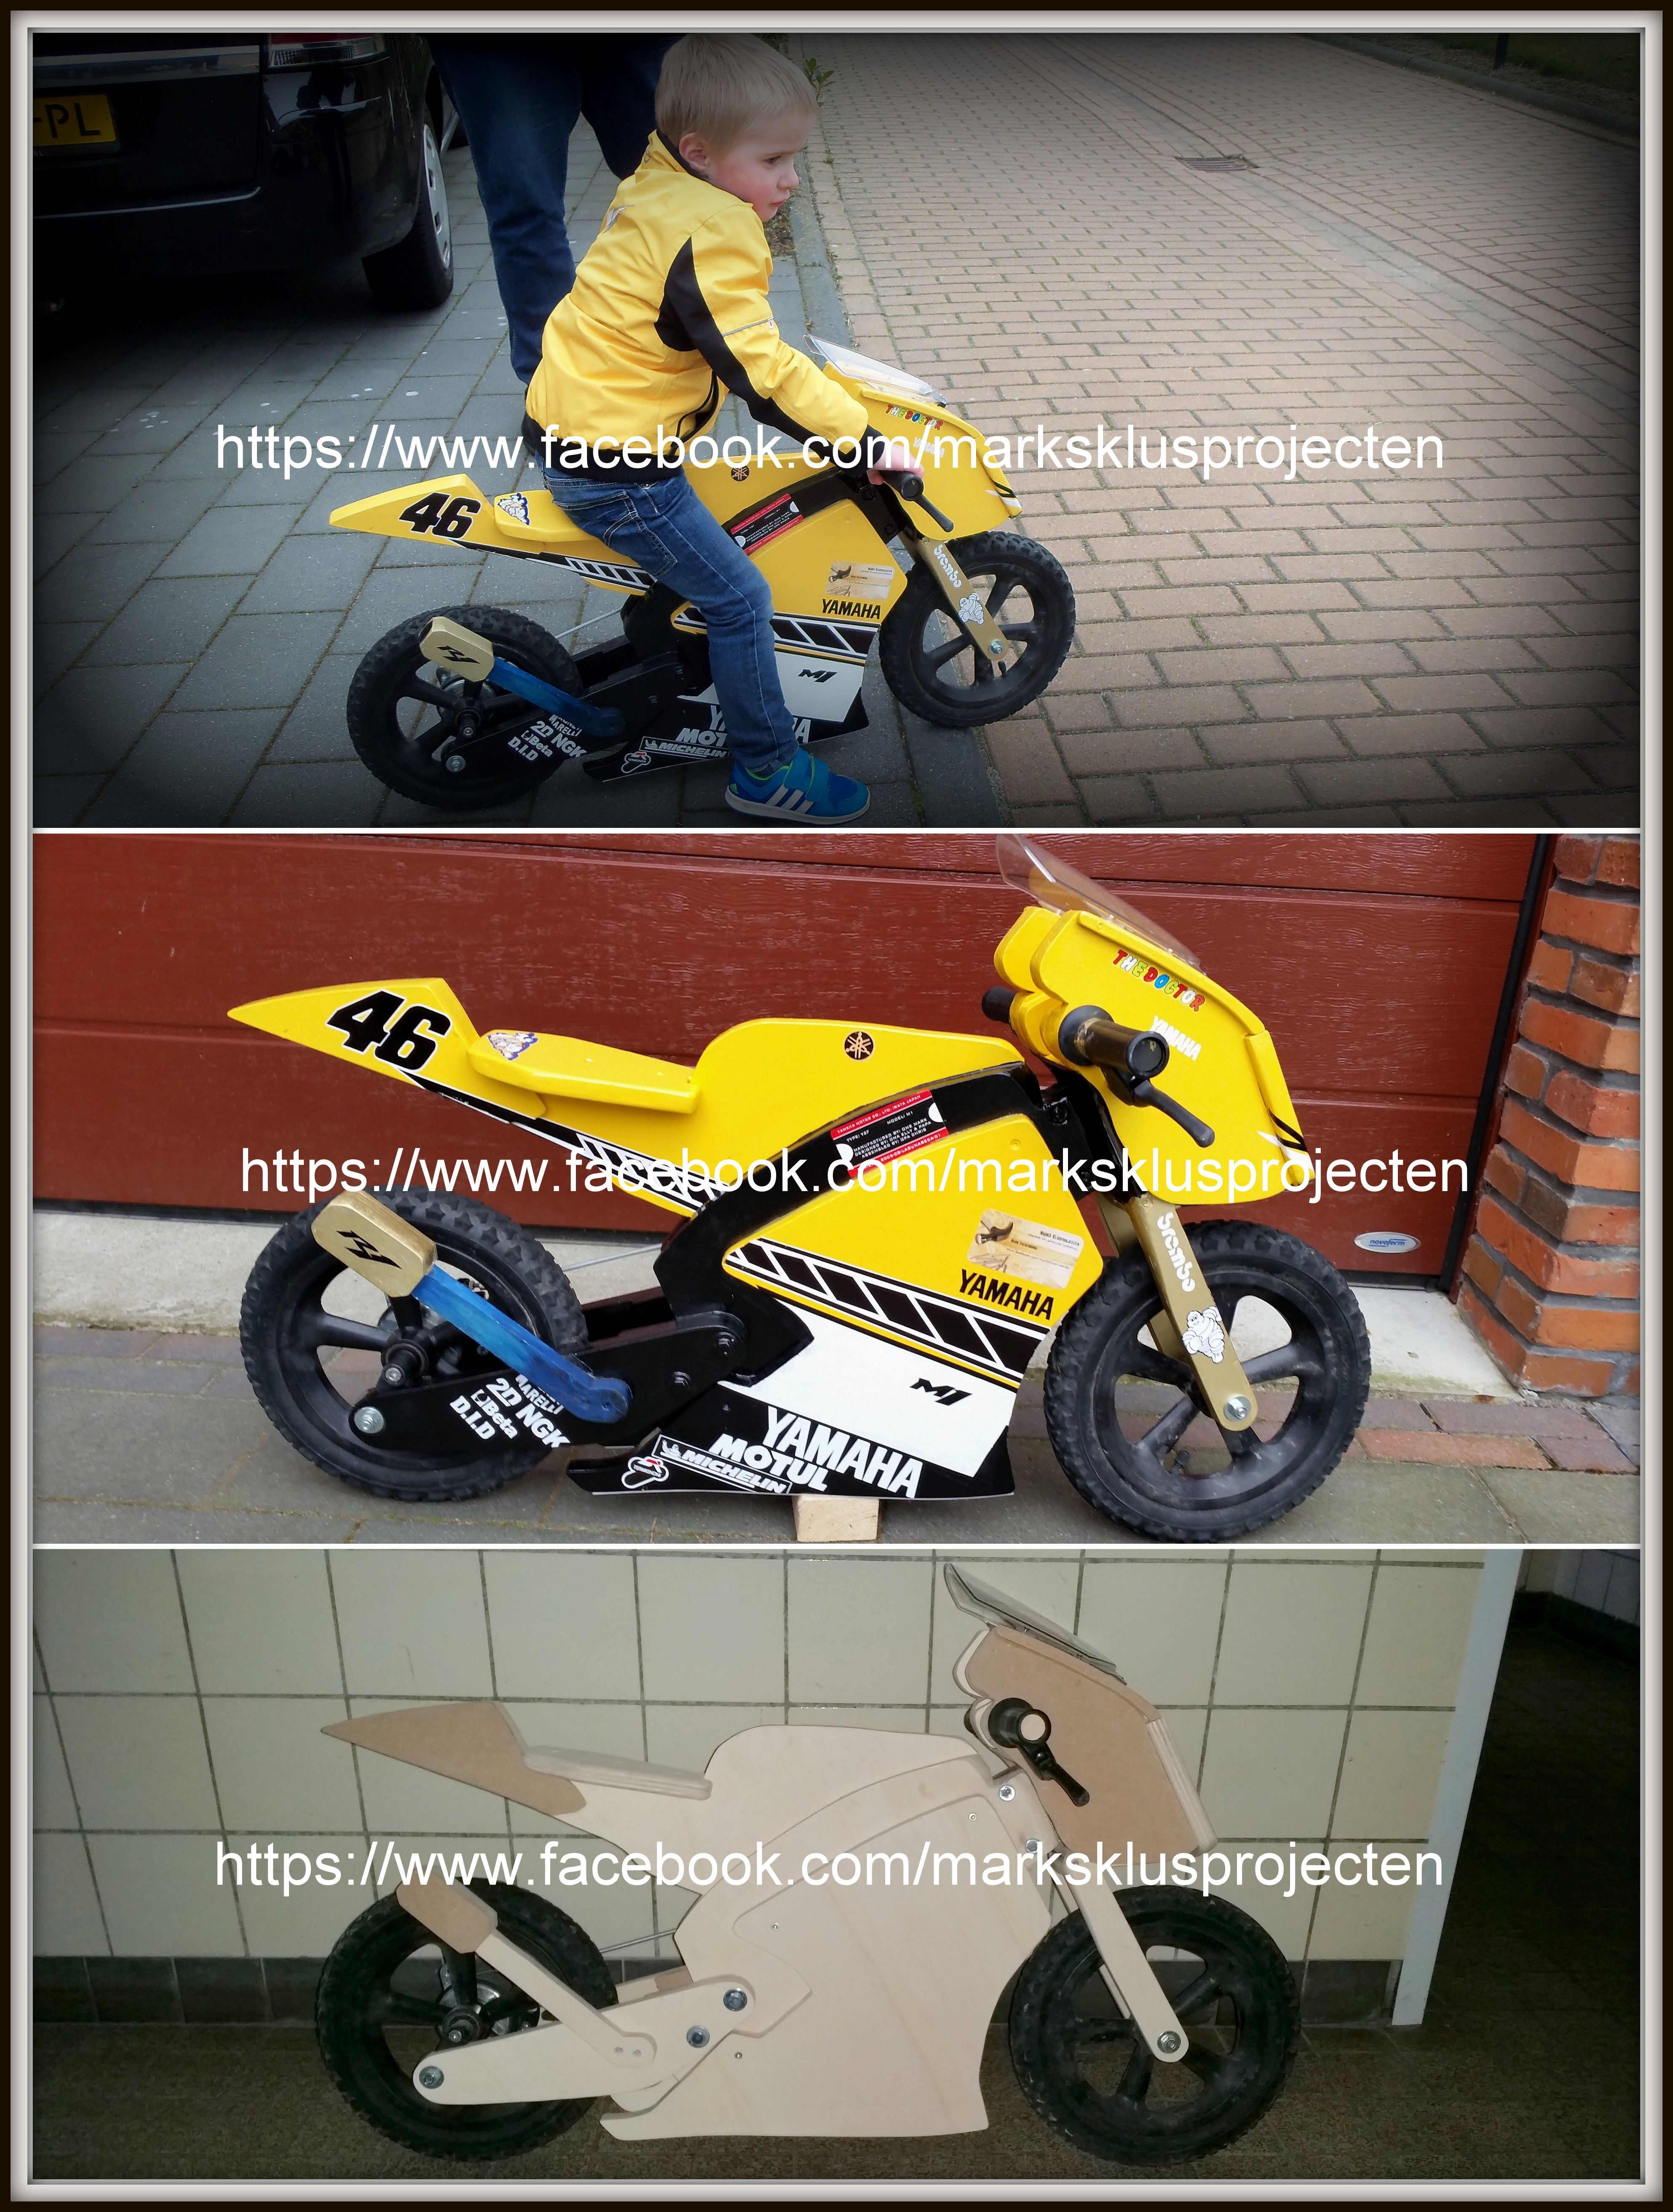 fc3cf729f8b Made a special edition Yamaha Moto GP Valentino Rossi balance bike ...